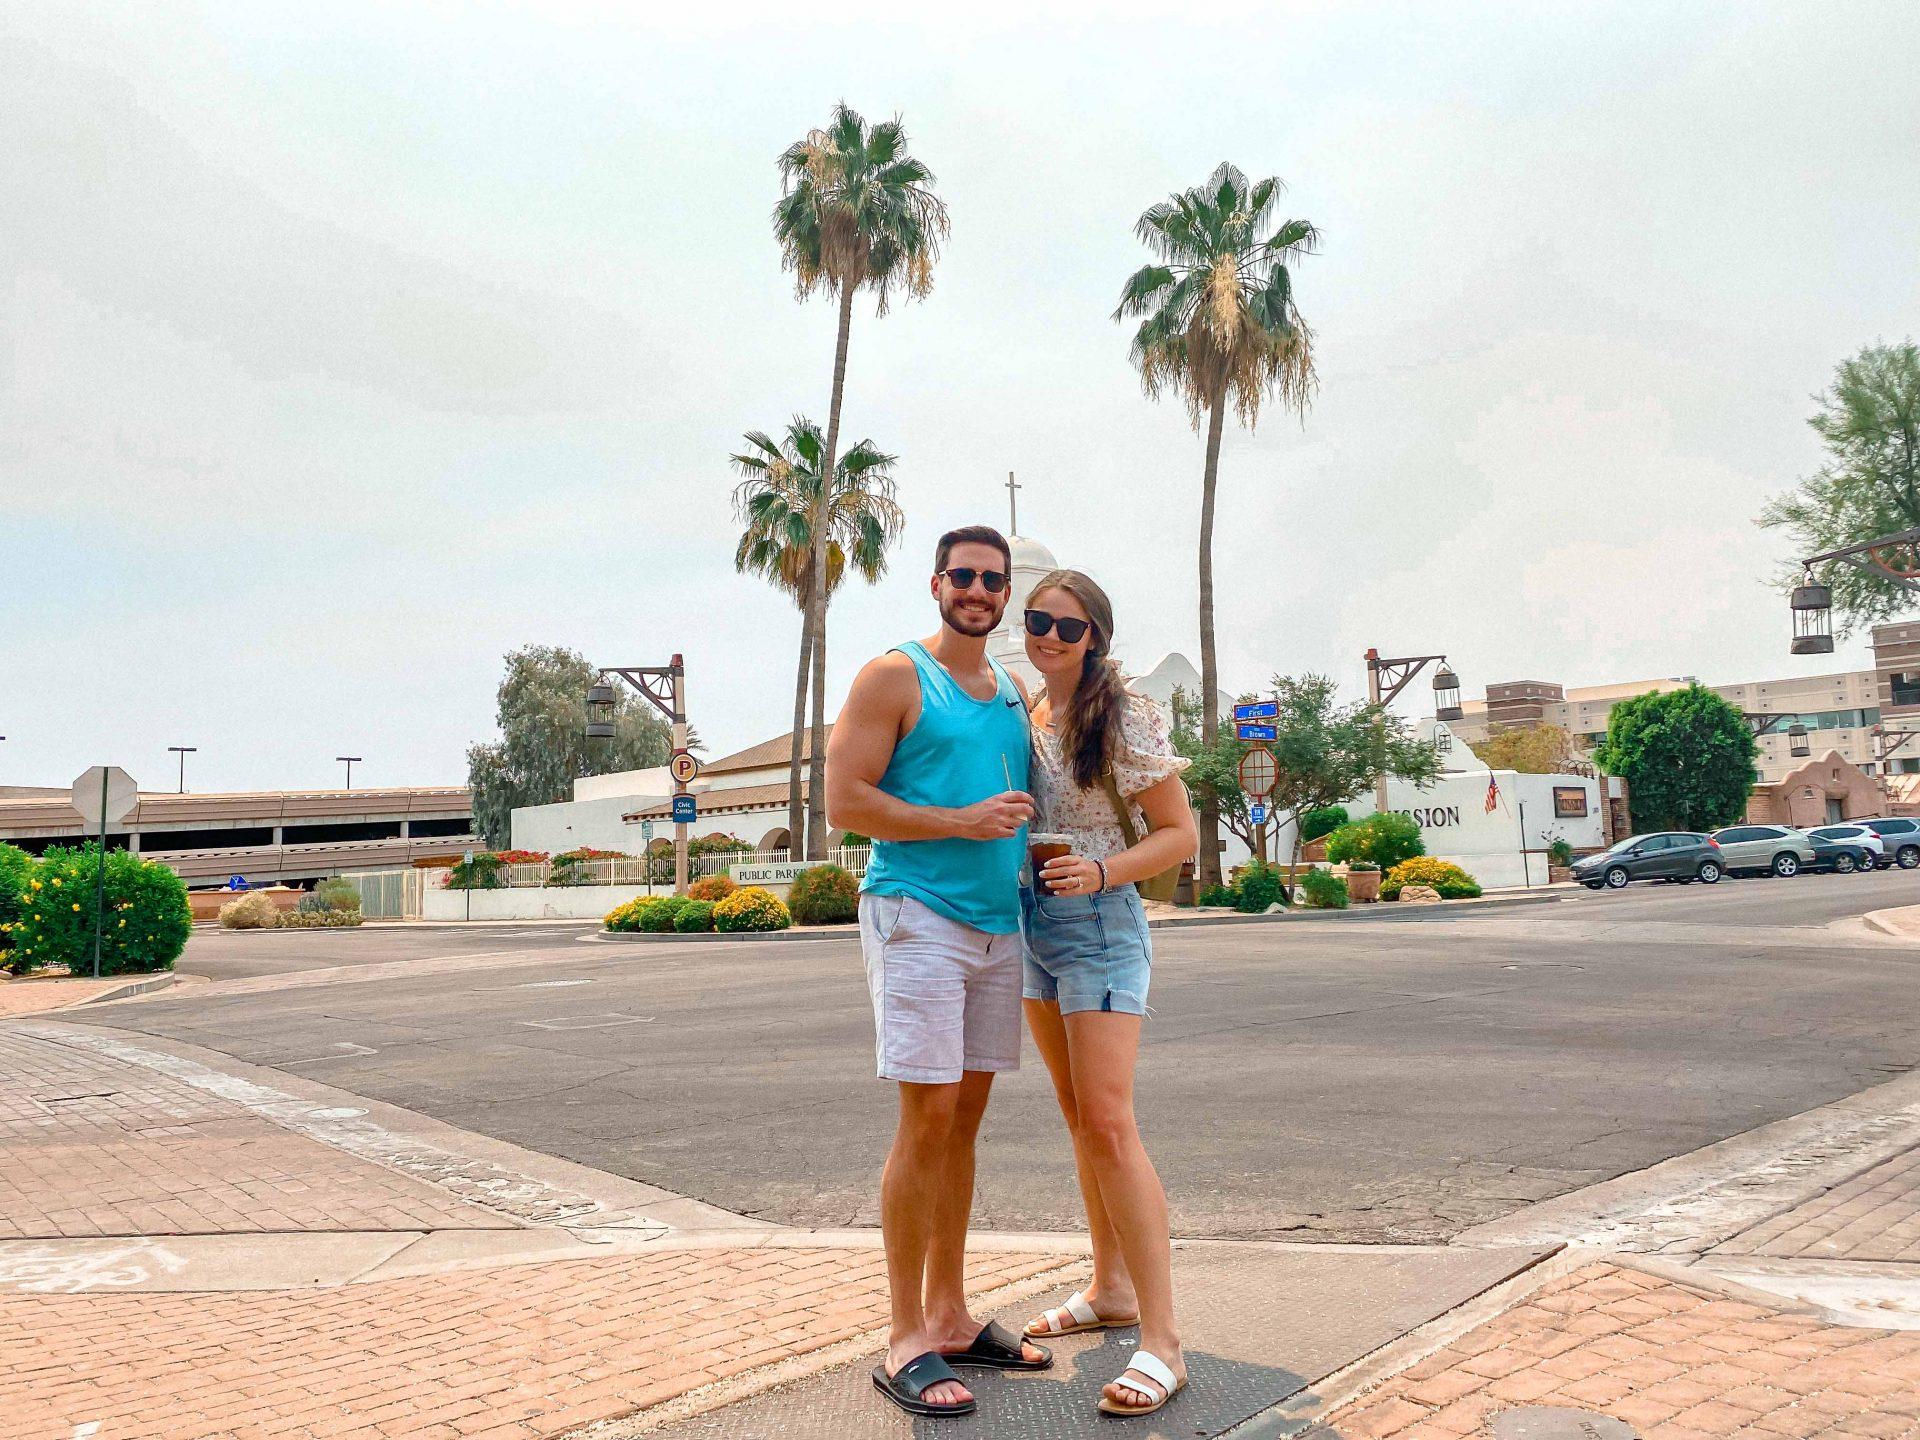 scottsdale arizona gelato tour, old town scottsdale tour, joyrideaz, travel guide to scottsdale Arizona, what to do in scottsdale, honeymoon, bachelorette, plan a trip to scottsdale, dessert, restaurants, everything to do in scottsdale.